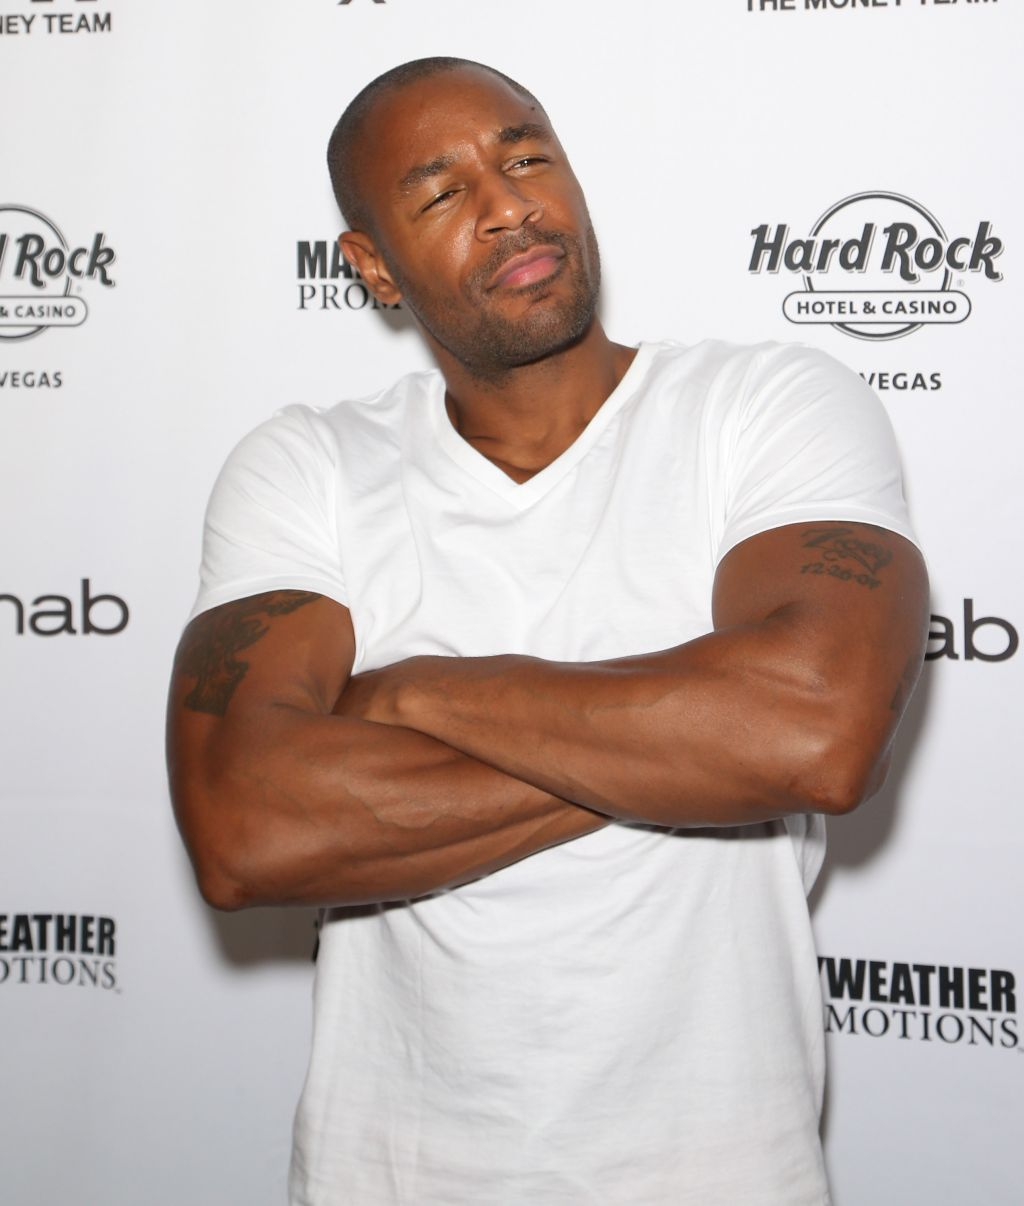 Floyd Mayweather Jr. At Rehab